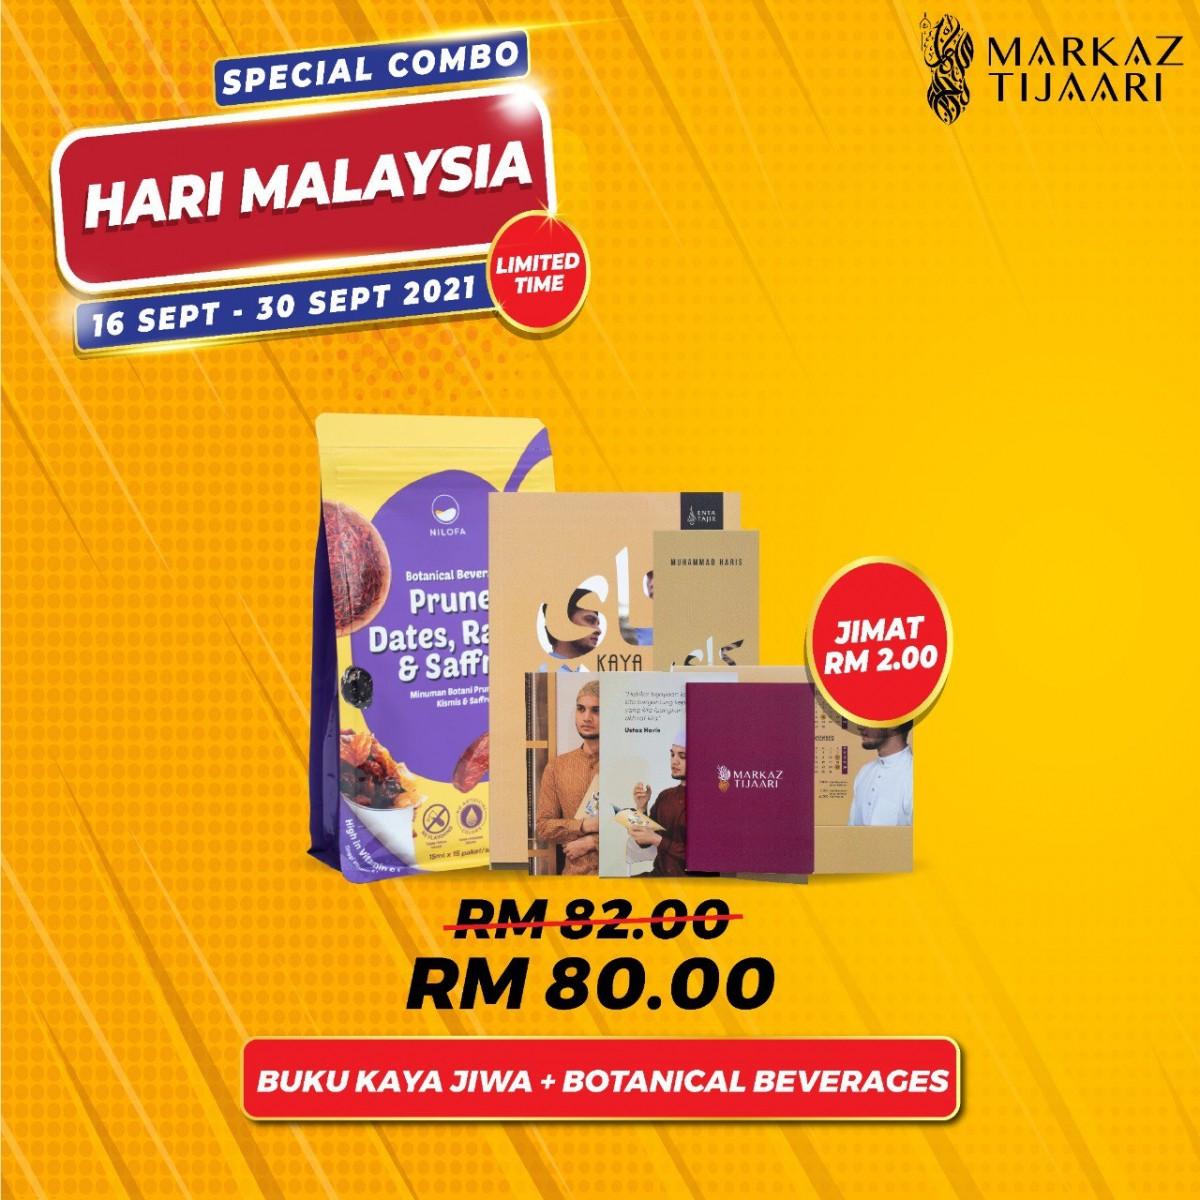 Malaysia Day Deals Buku Kaya Jiwa + Botanical Beverage - MARKAZ TIJAARI